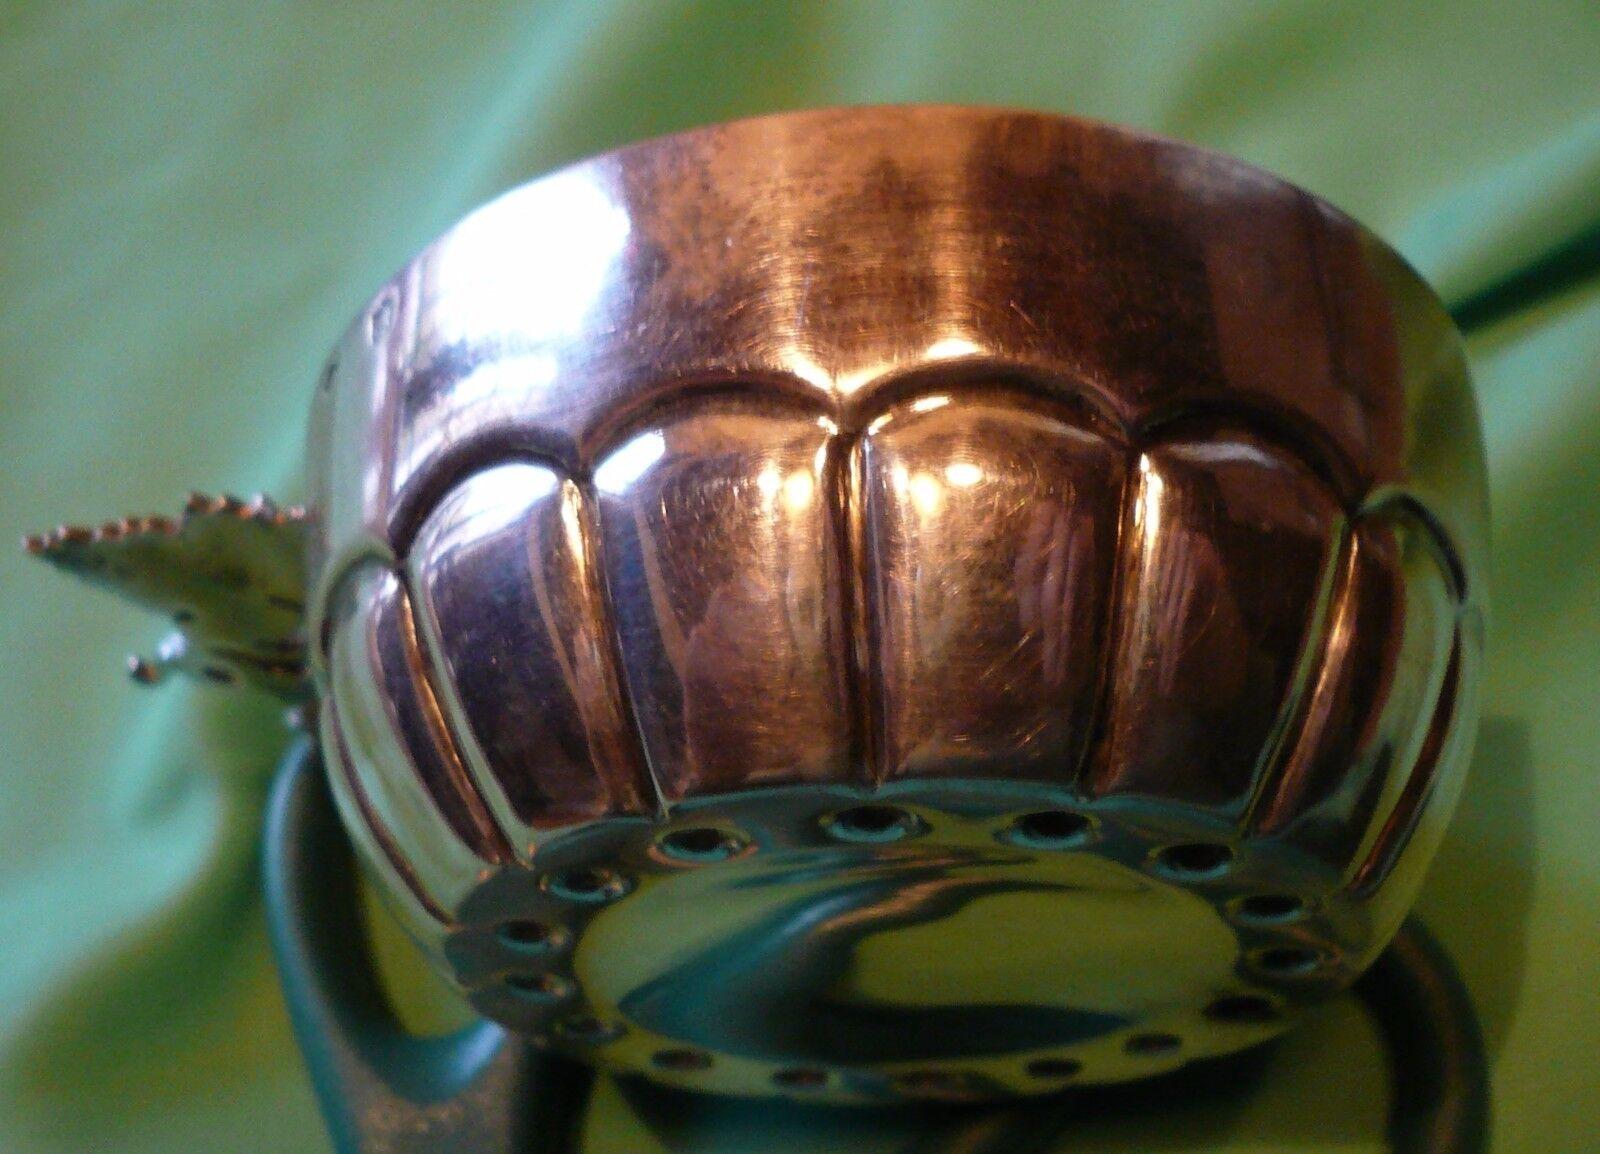 Tastevin taste vin argent  massif  heavy  sterling silver wine taster winetaster